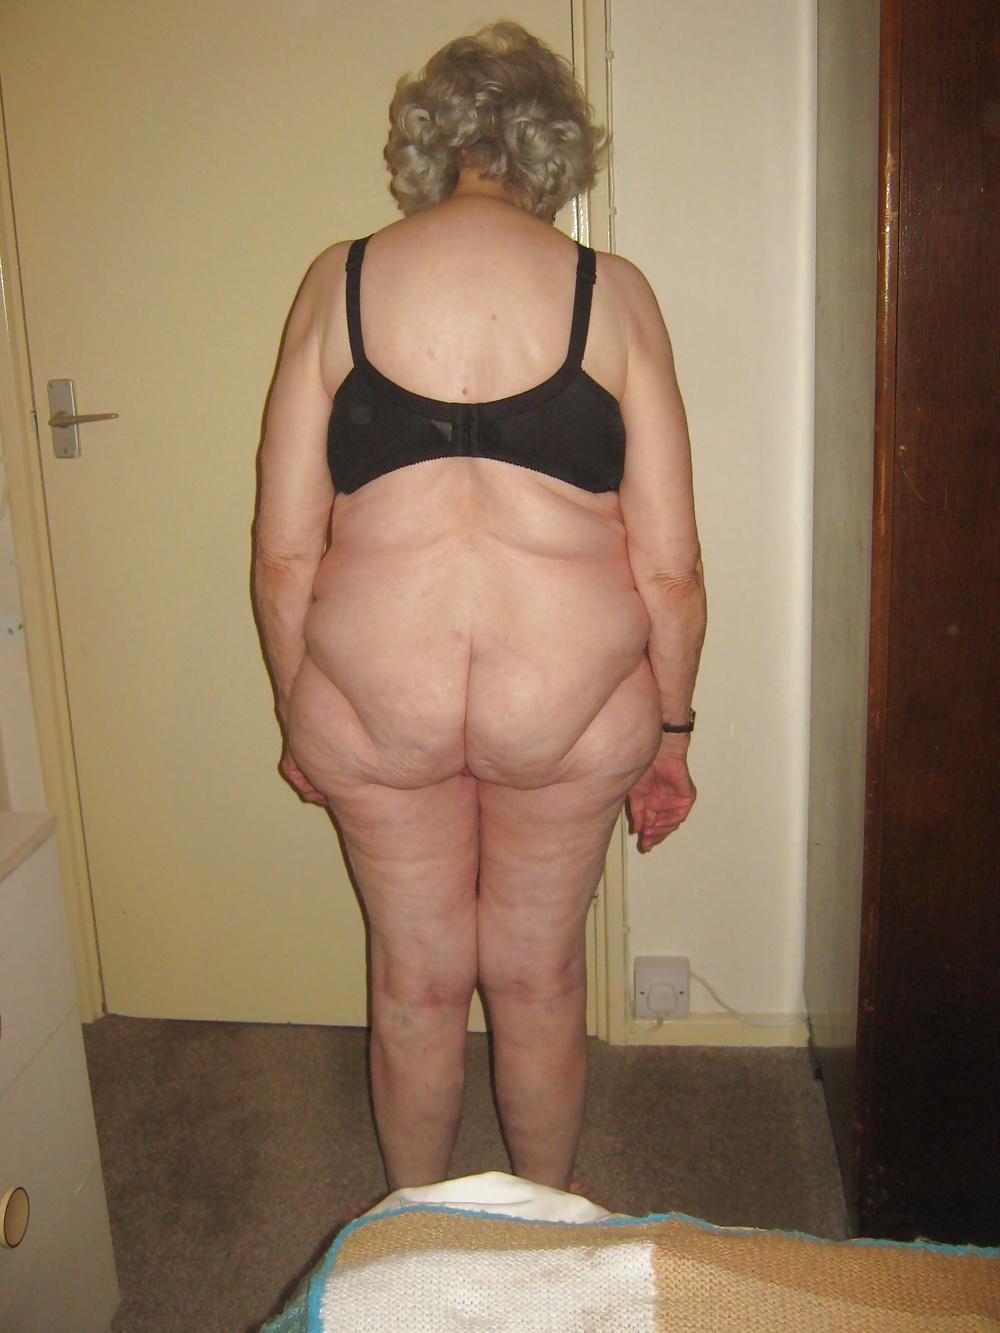 Sheila 80 Year Old Slut Granny From Uk - 18 Pics  Xhamster-8169